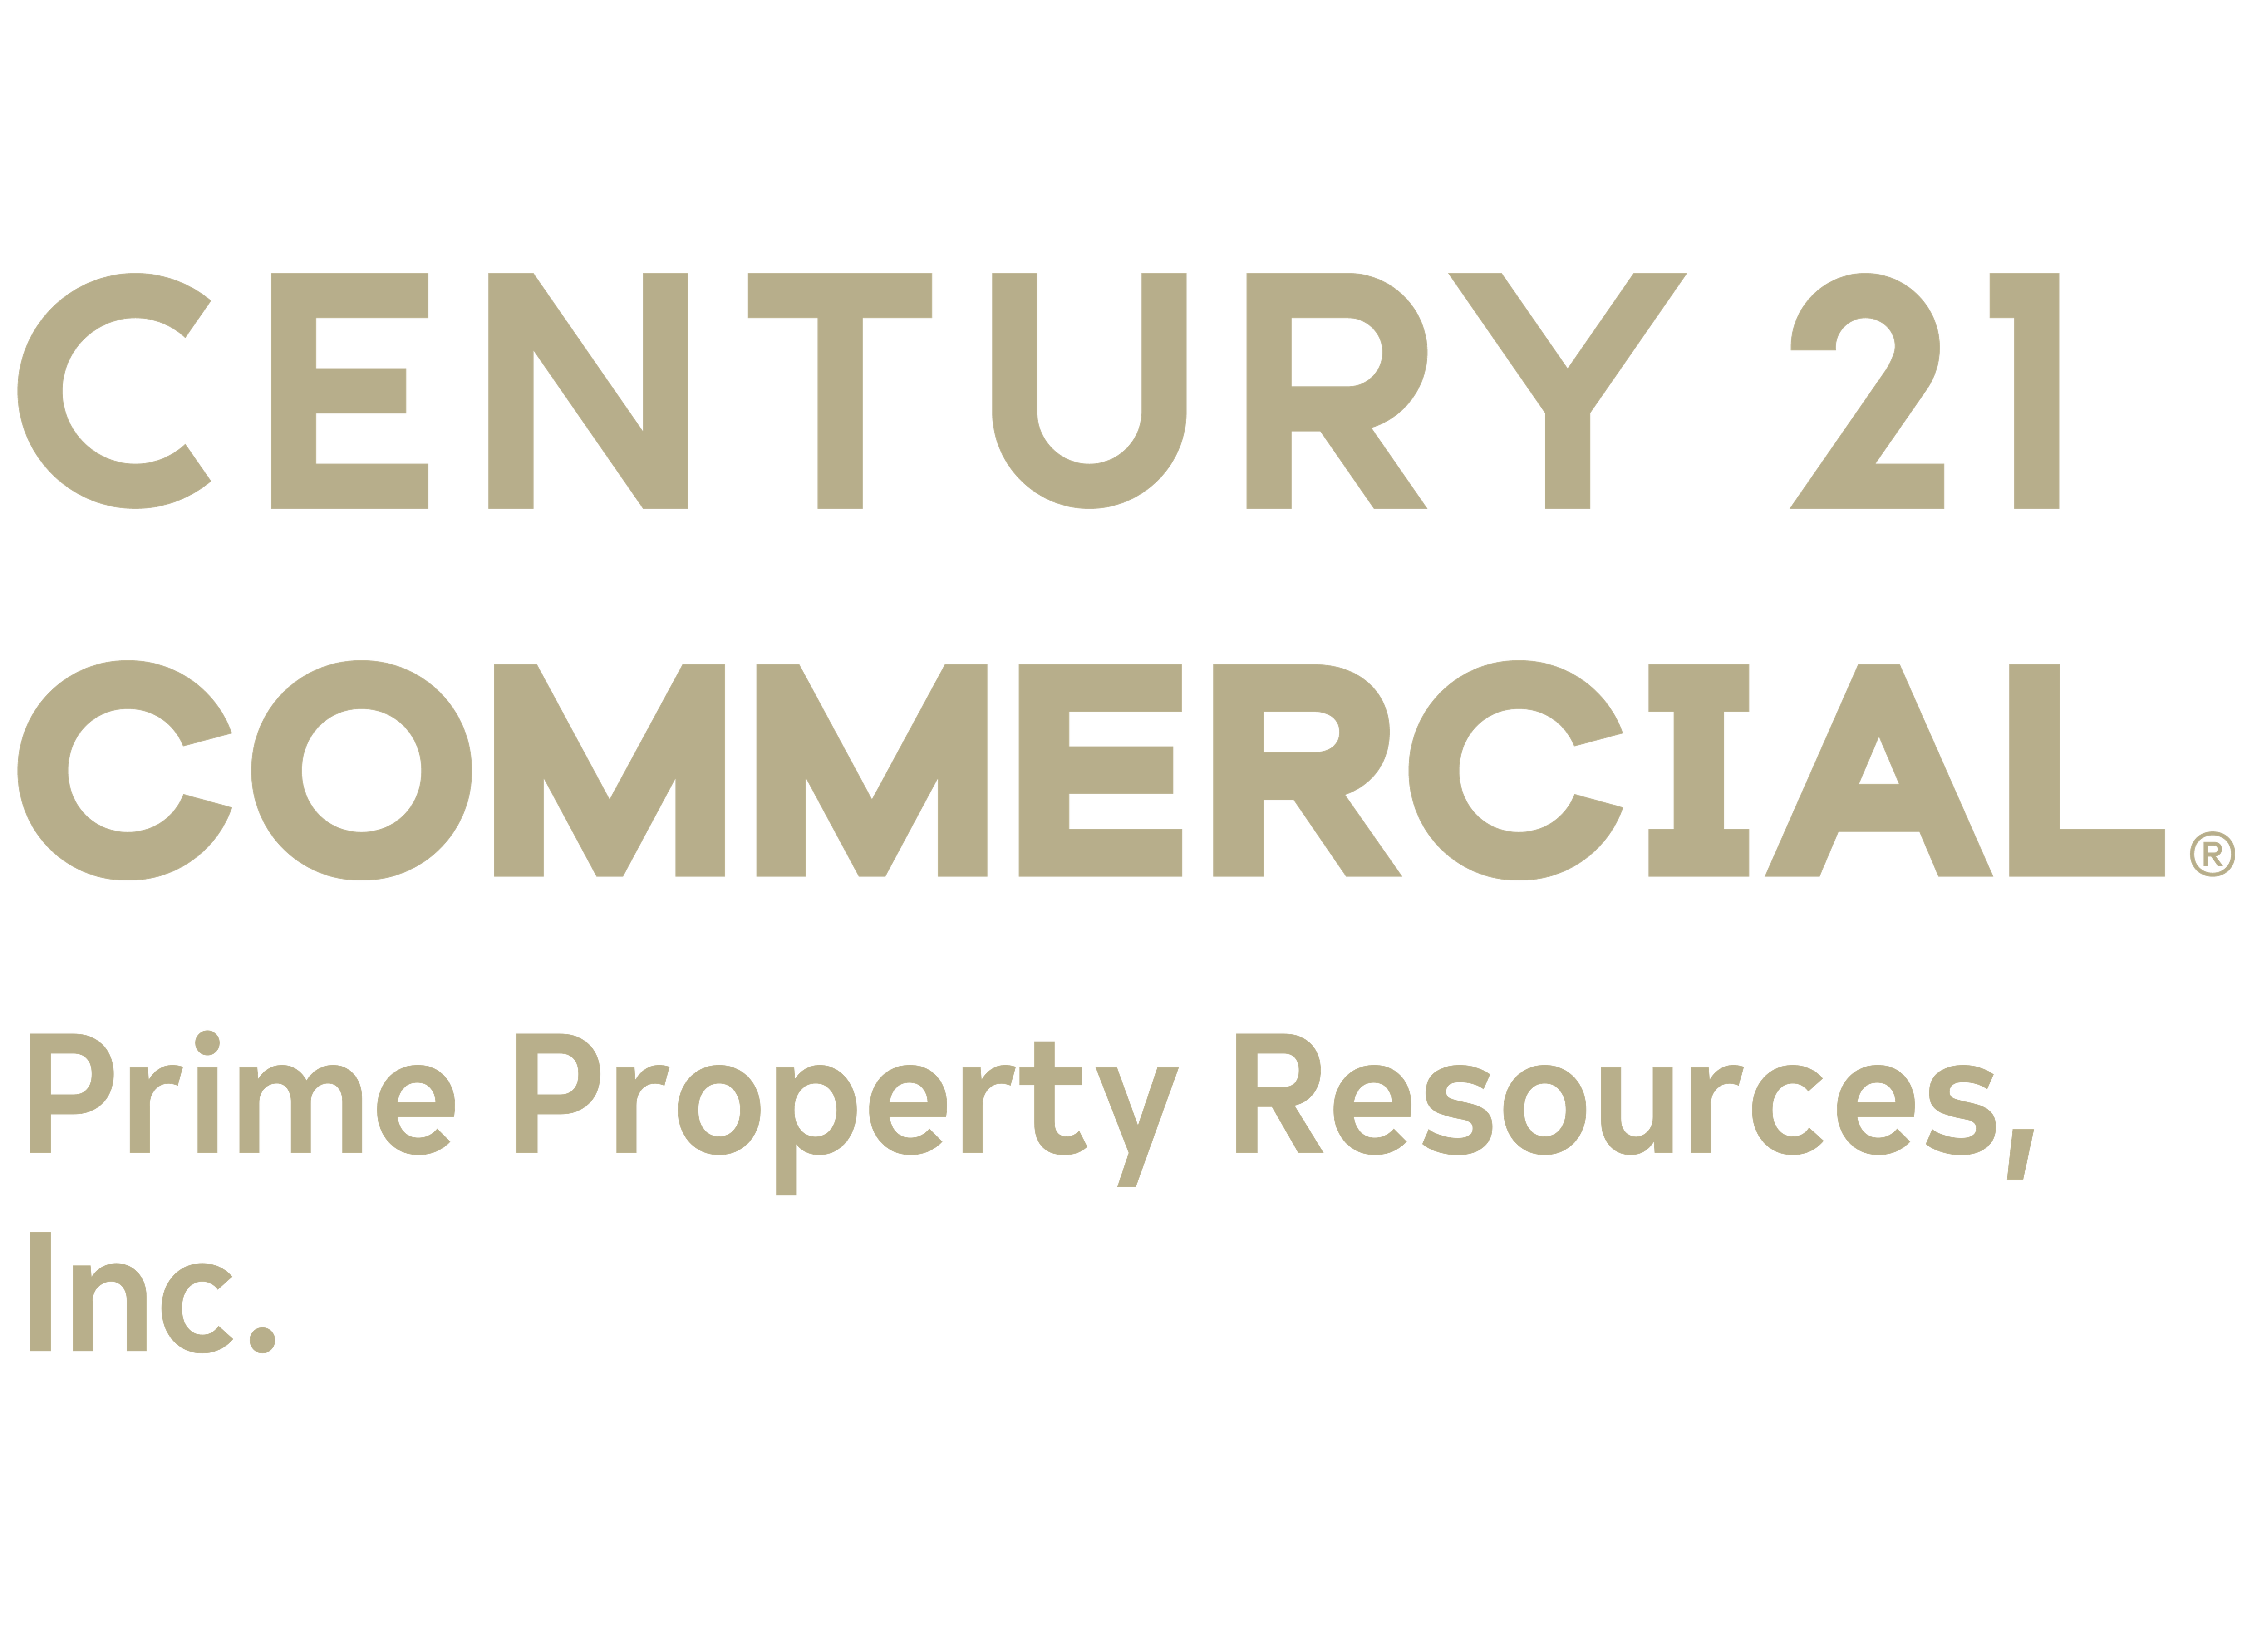 Robert Southern Jr. of CENTURY 21 Prime Property Resources, Inc. logo